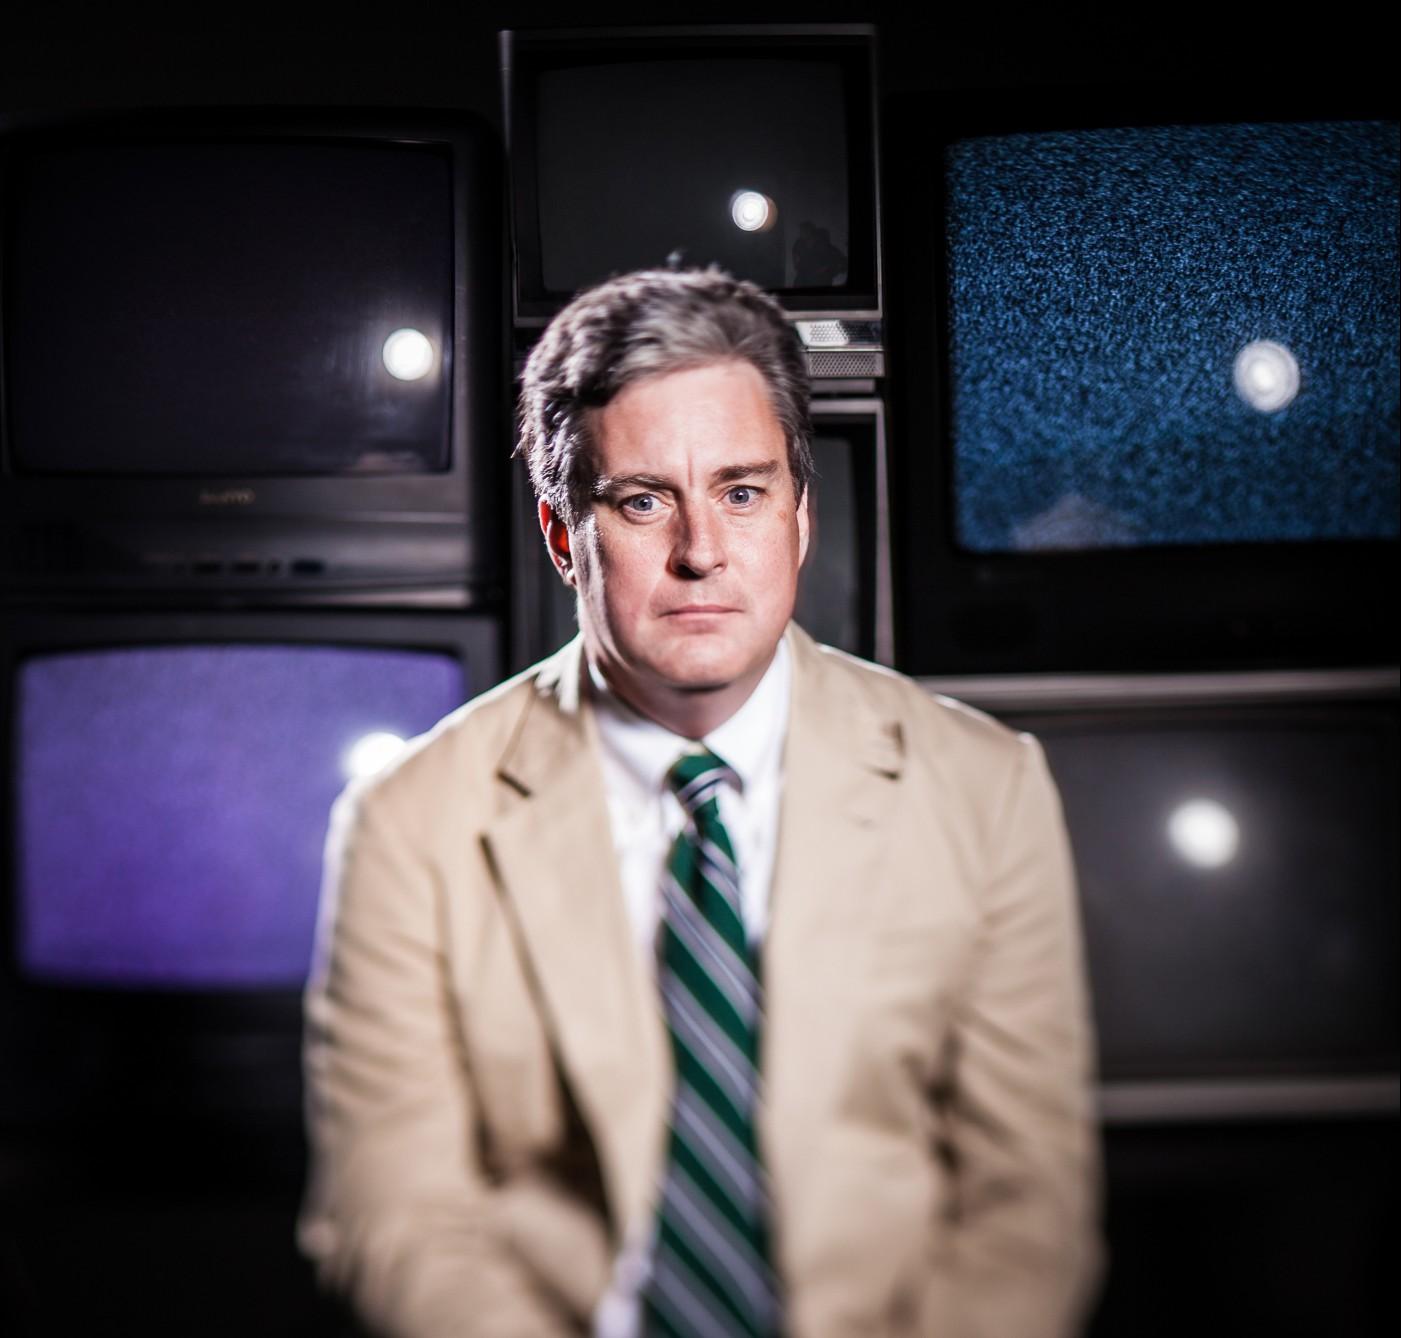 Results image of Richard Schneider President of Antennas Direct